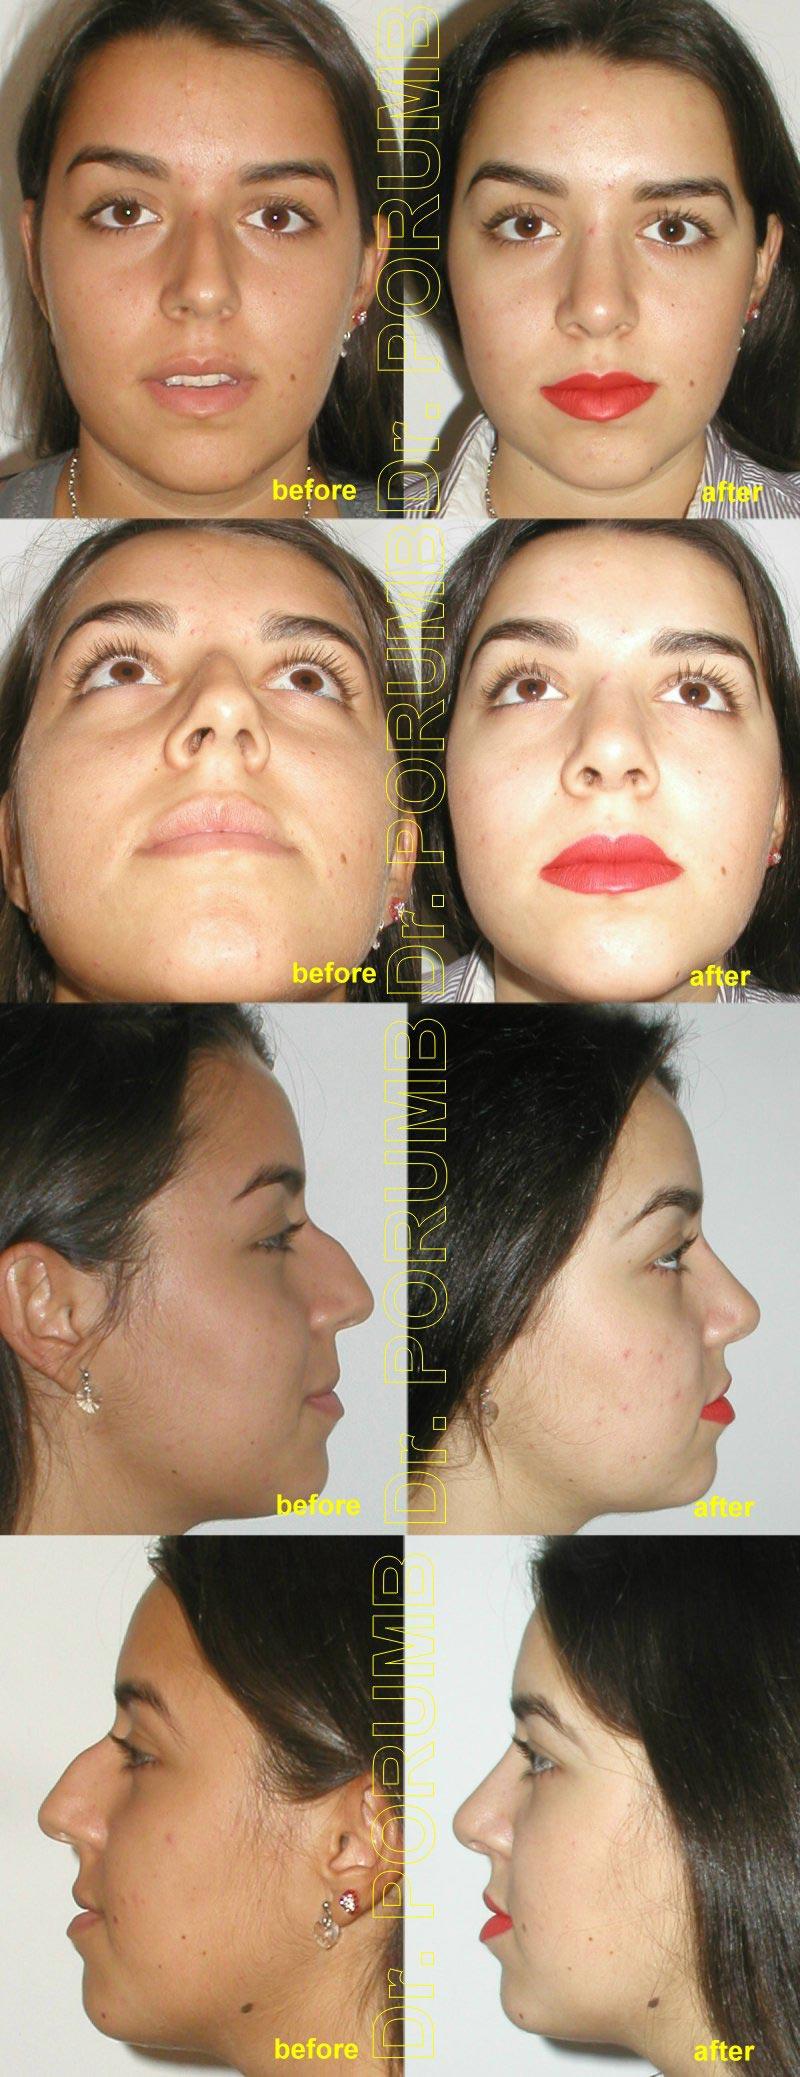 Pacienta de 23 ani, nemultumita de deviatia majora a nasului, de deviatia de sep